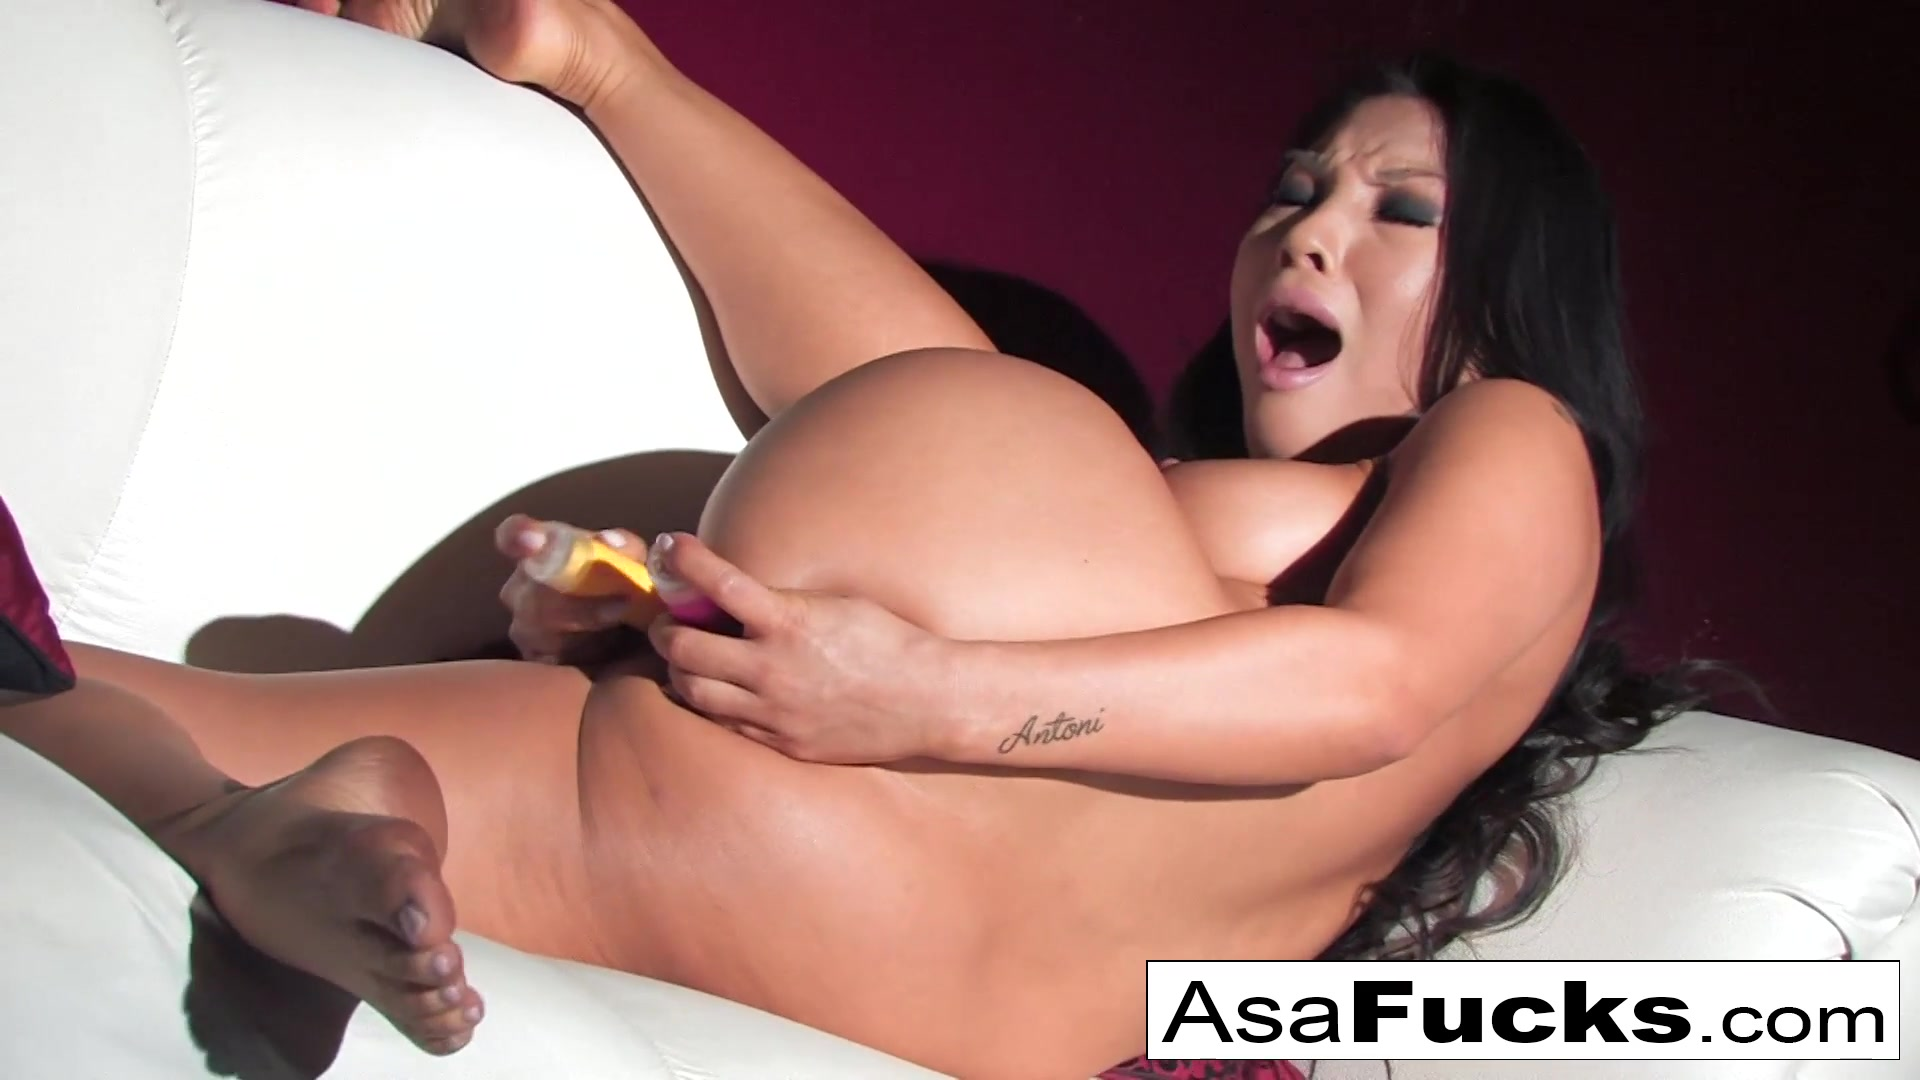 Asa Akira in Asas Hot Two Toy Dp - AsaAkira Latina With Huge Ass Gets Fucked